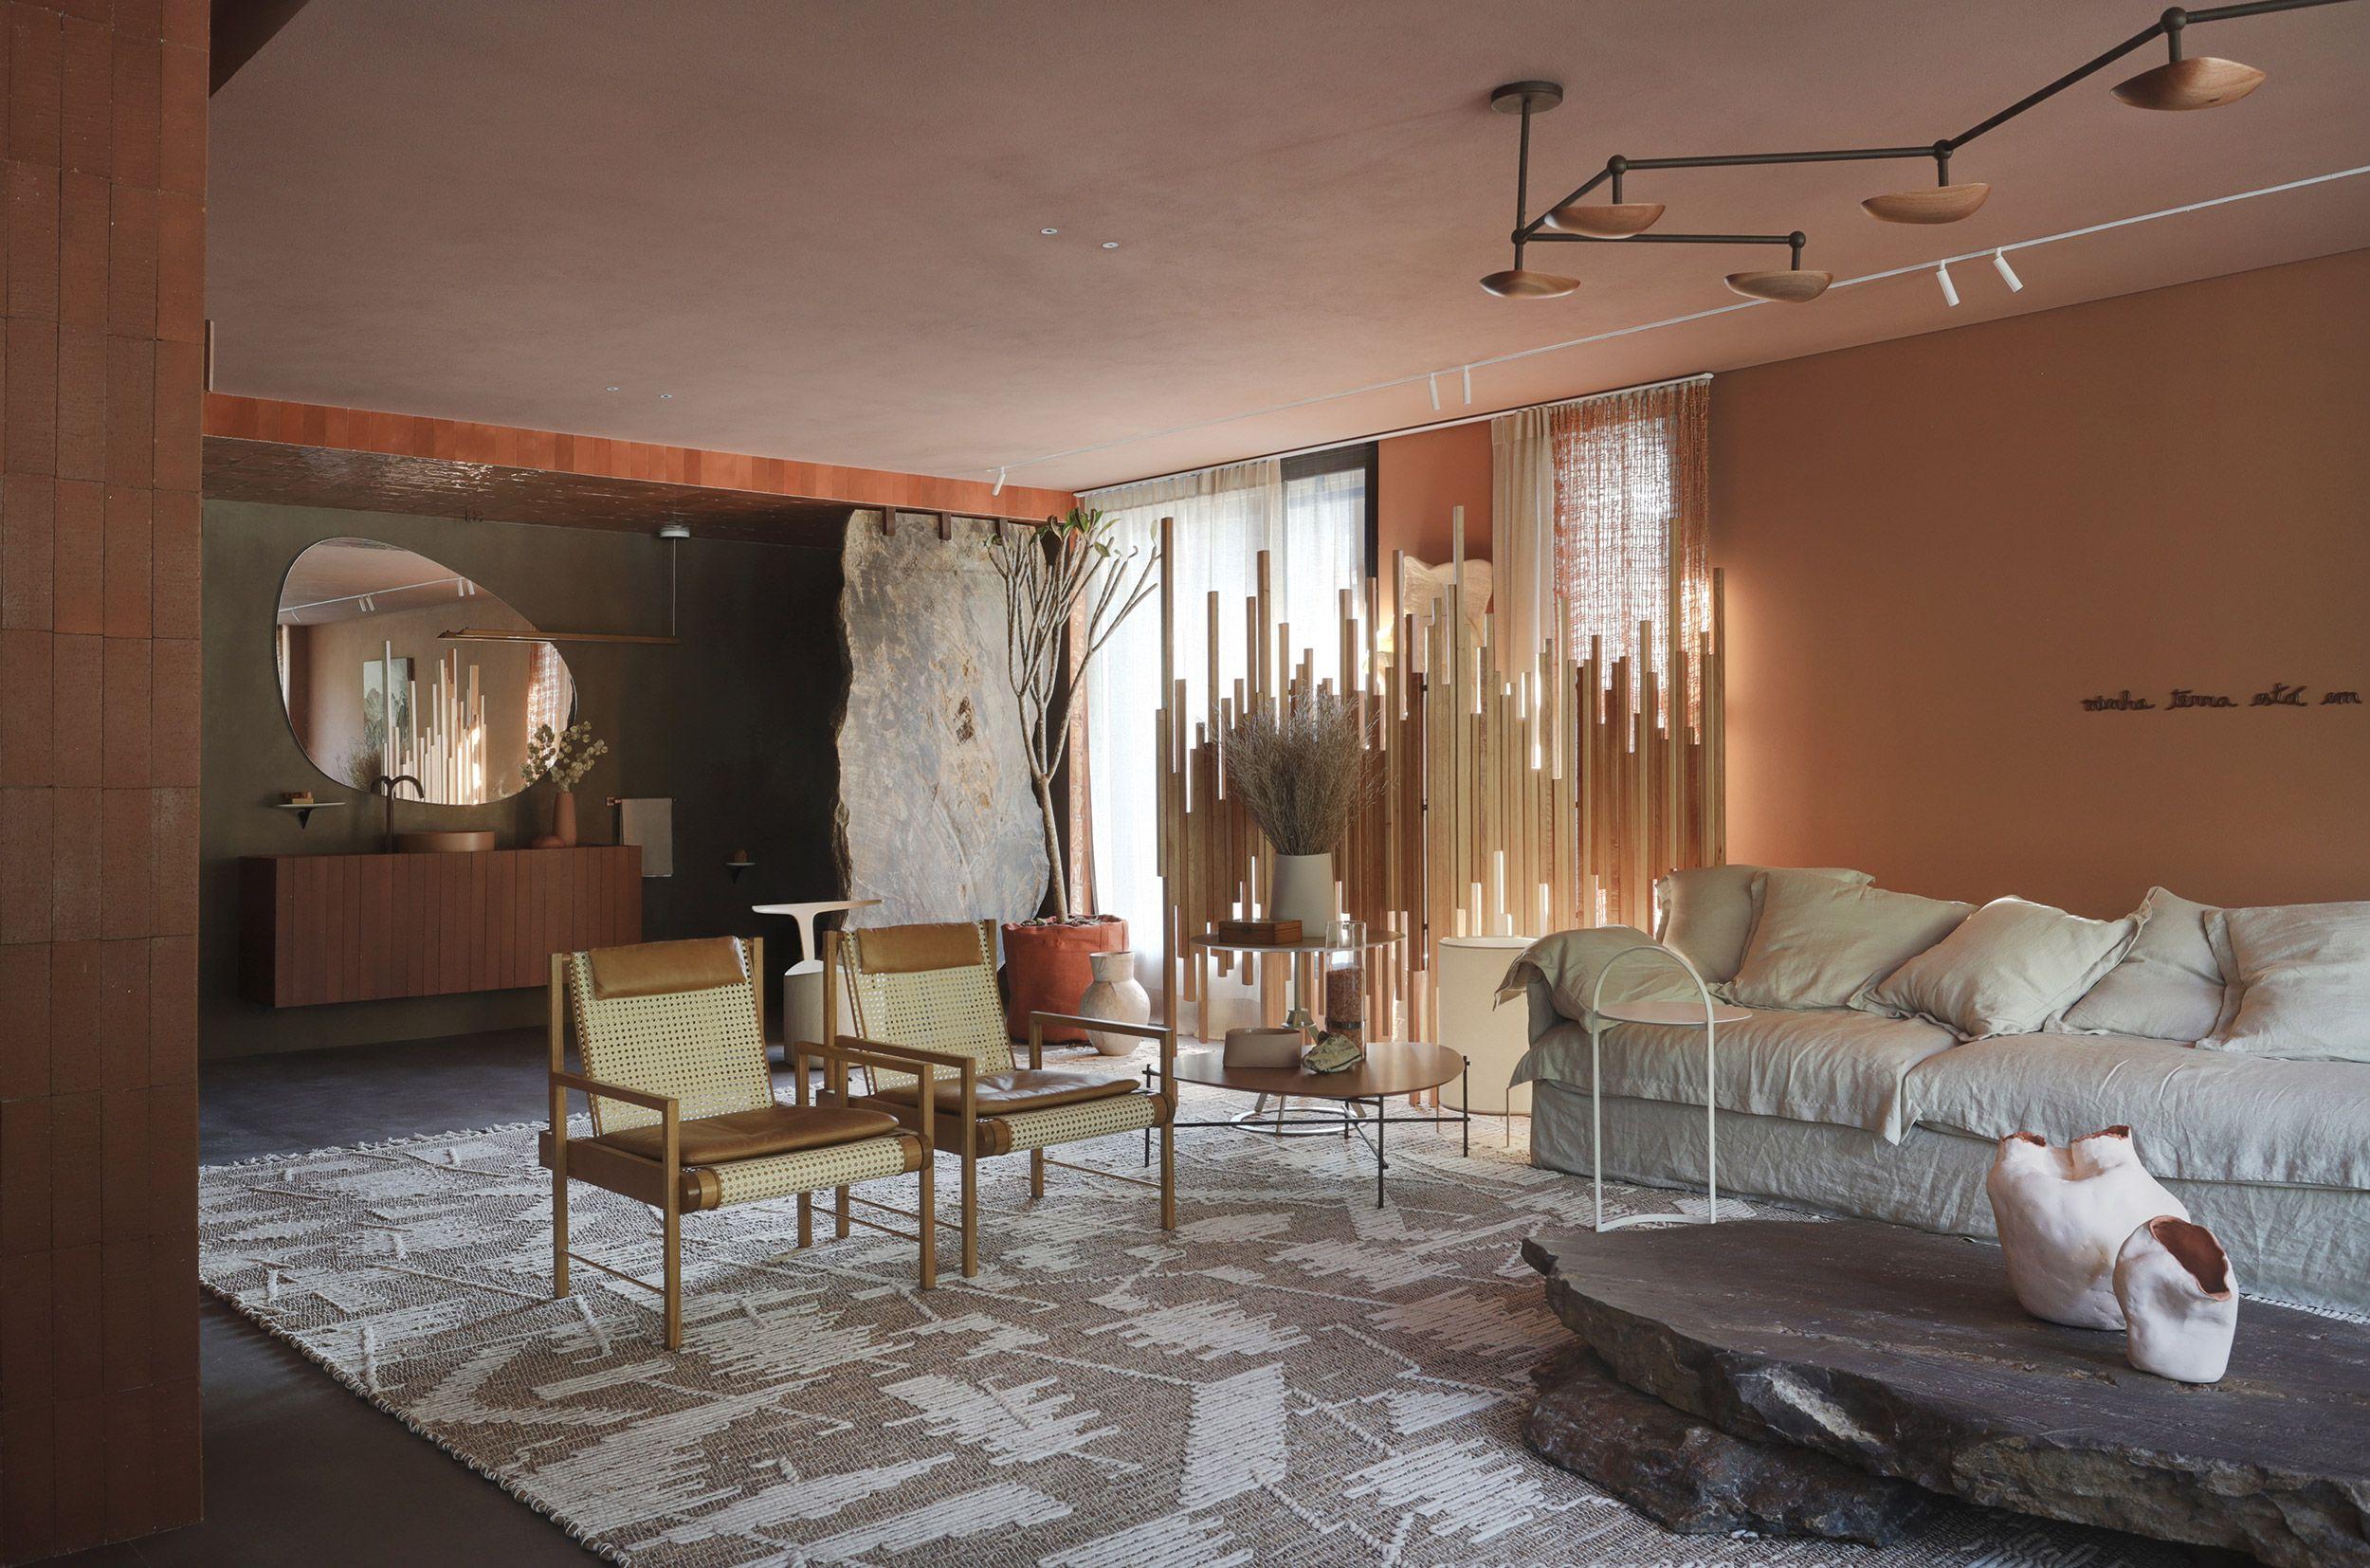 Sala decorada com tons terrosos